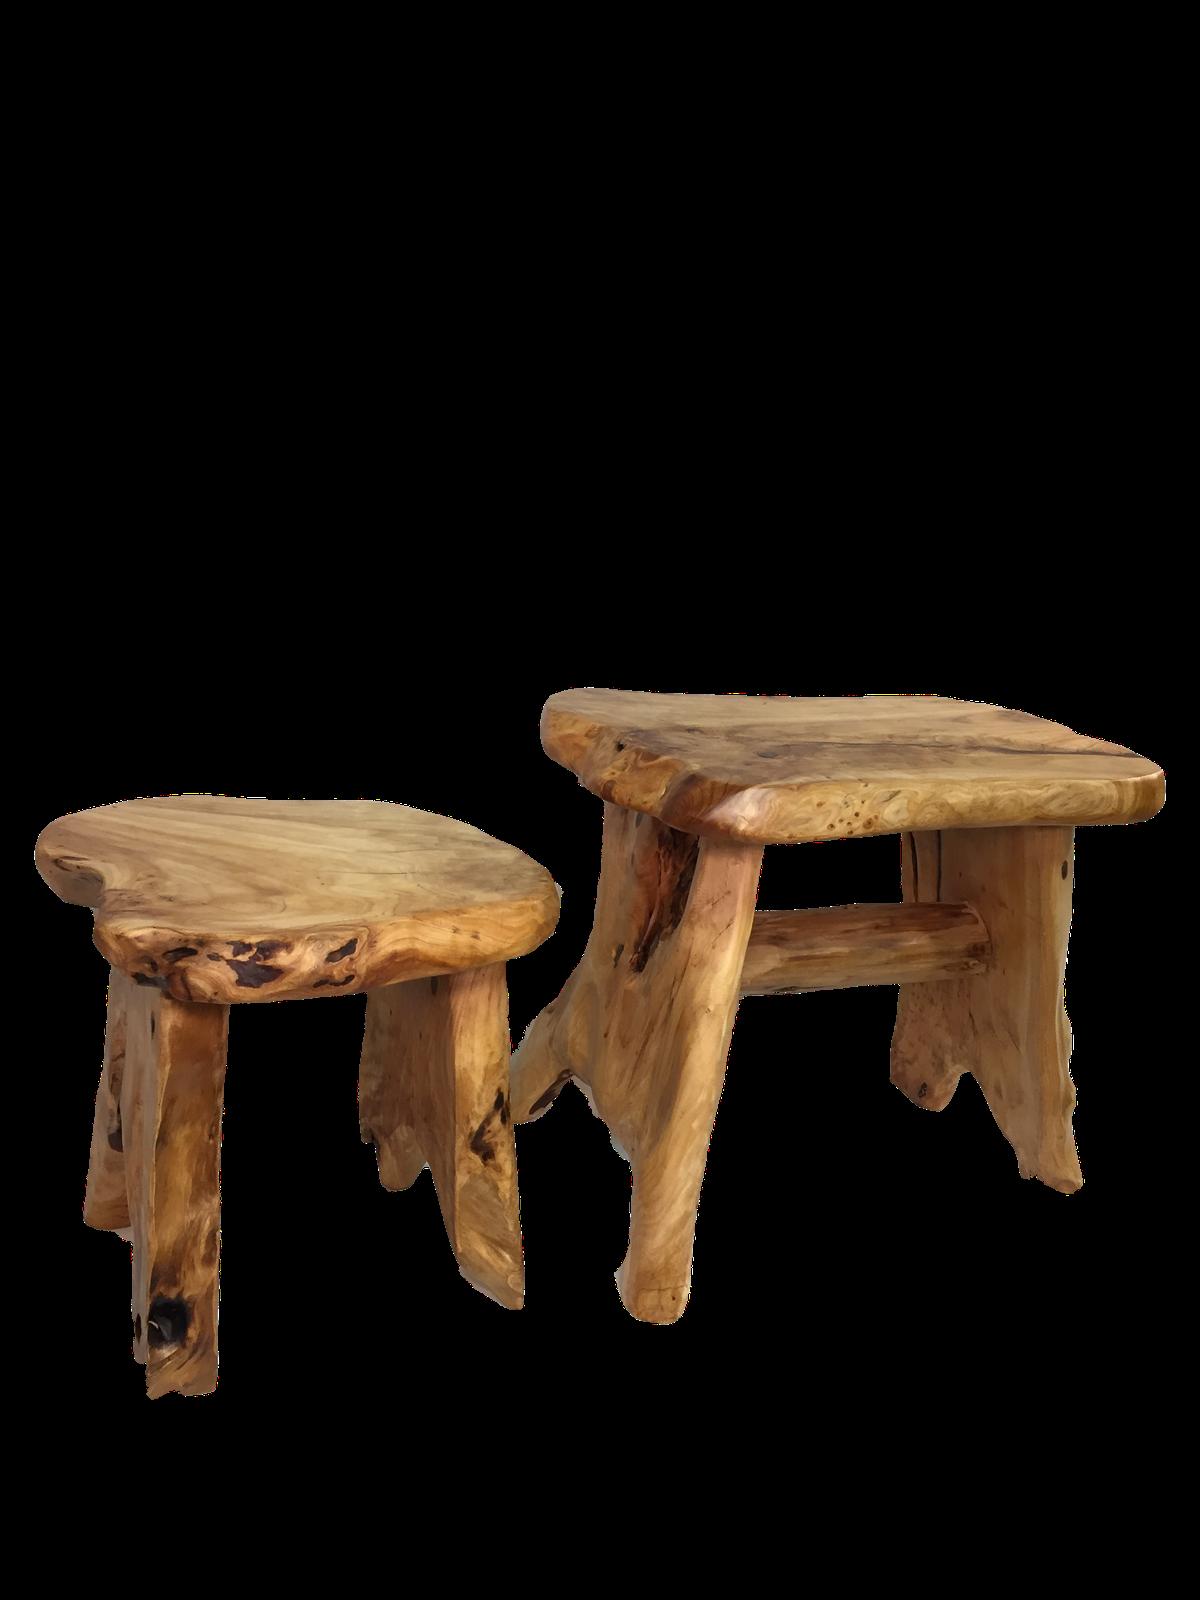 Wood Table | Trada Marketplace